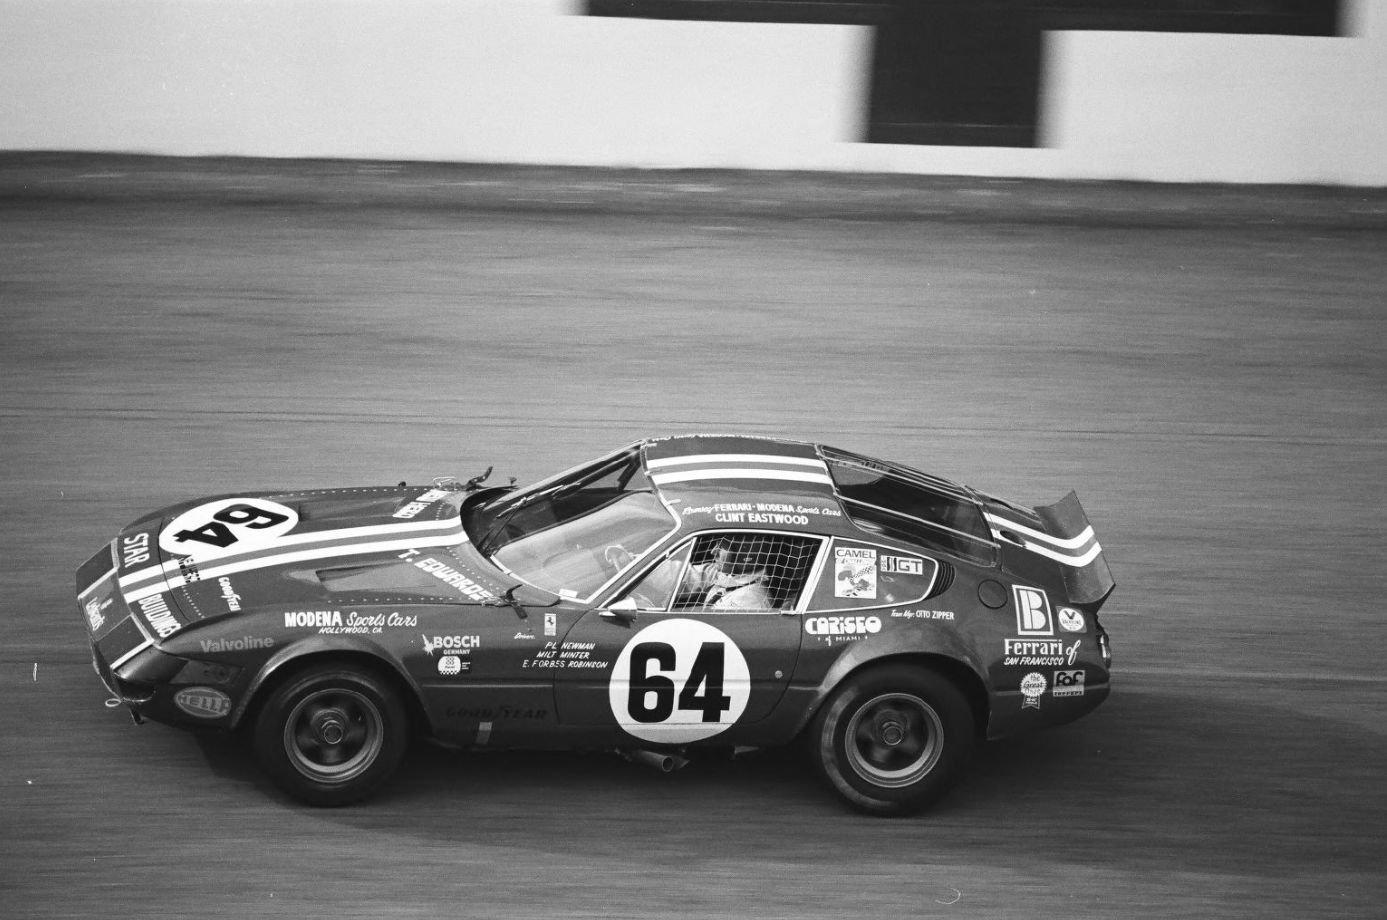 Ferrari_Daytona_64_PLN.jpg